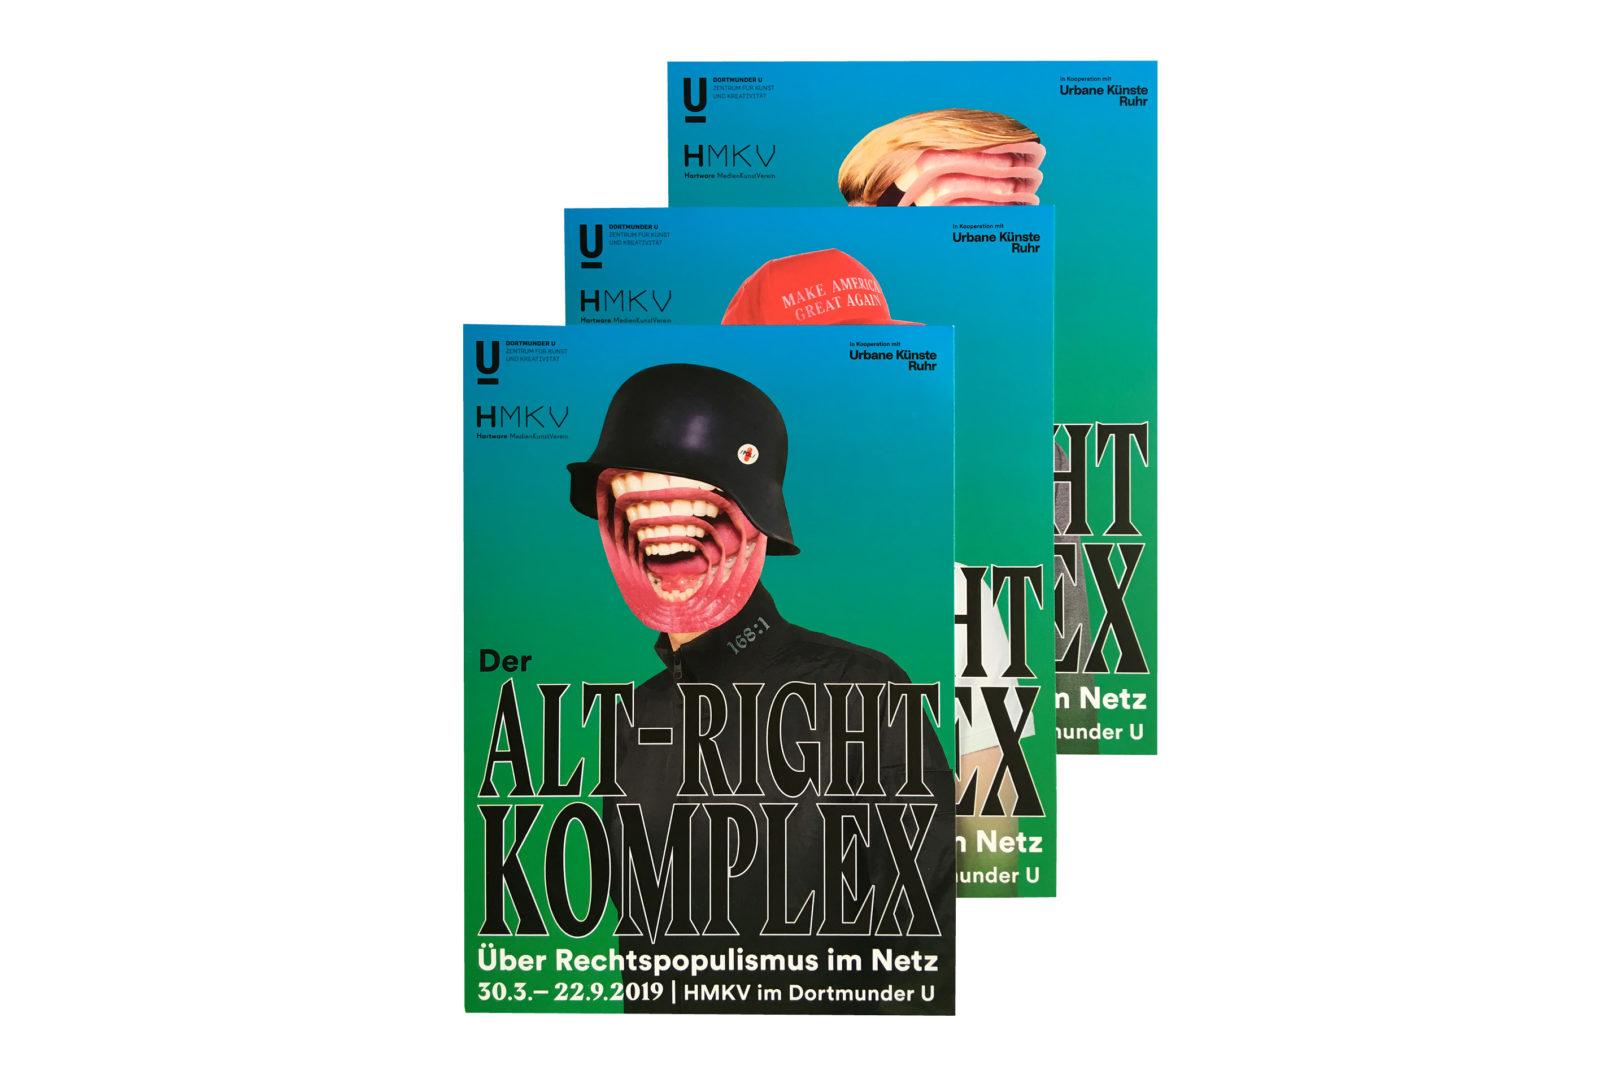 http://e-o-t.de/wordpress/wp-content/uploads/2019/04/eot-AltRightKomplex-identity8.jpg